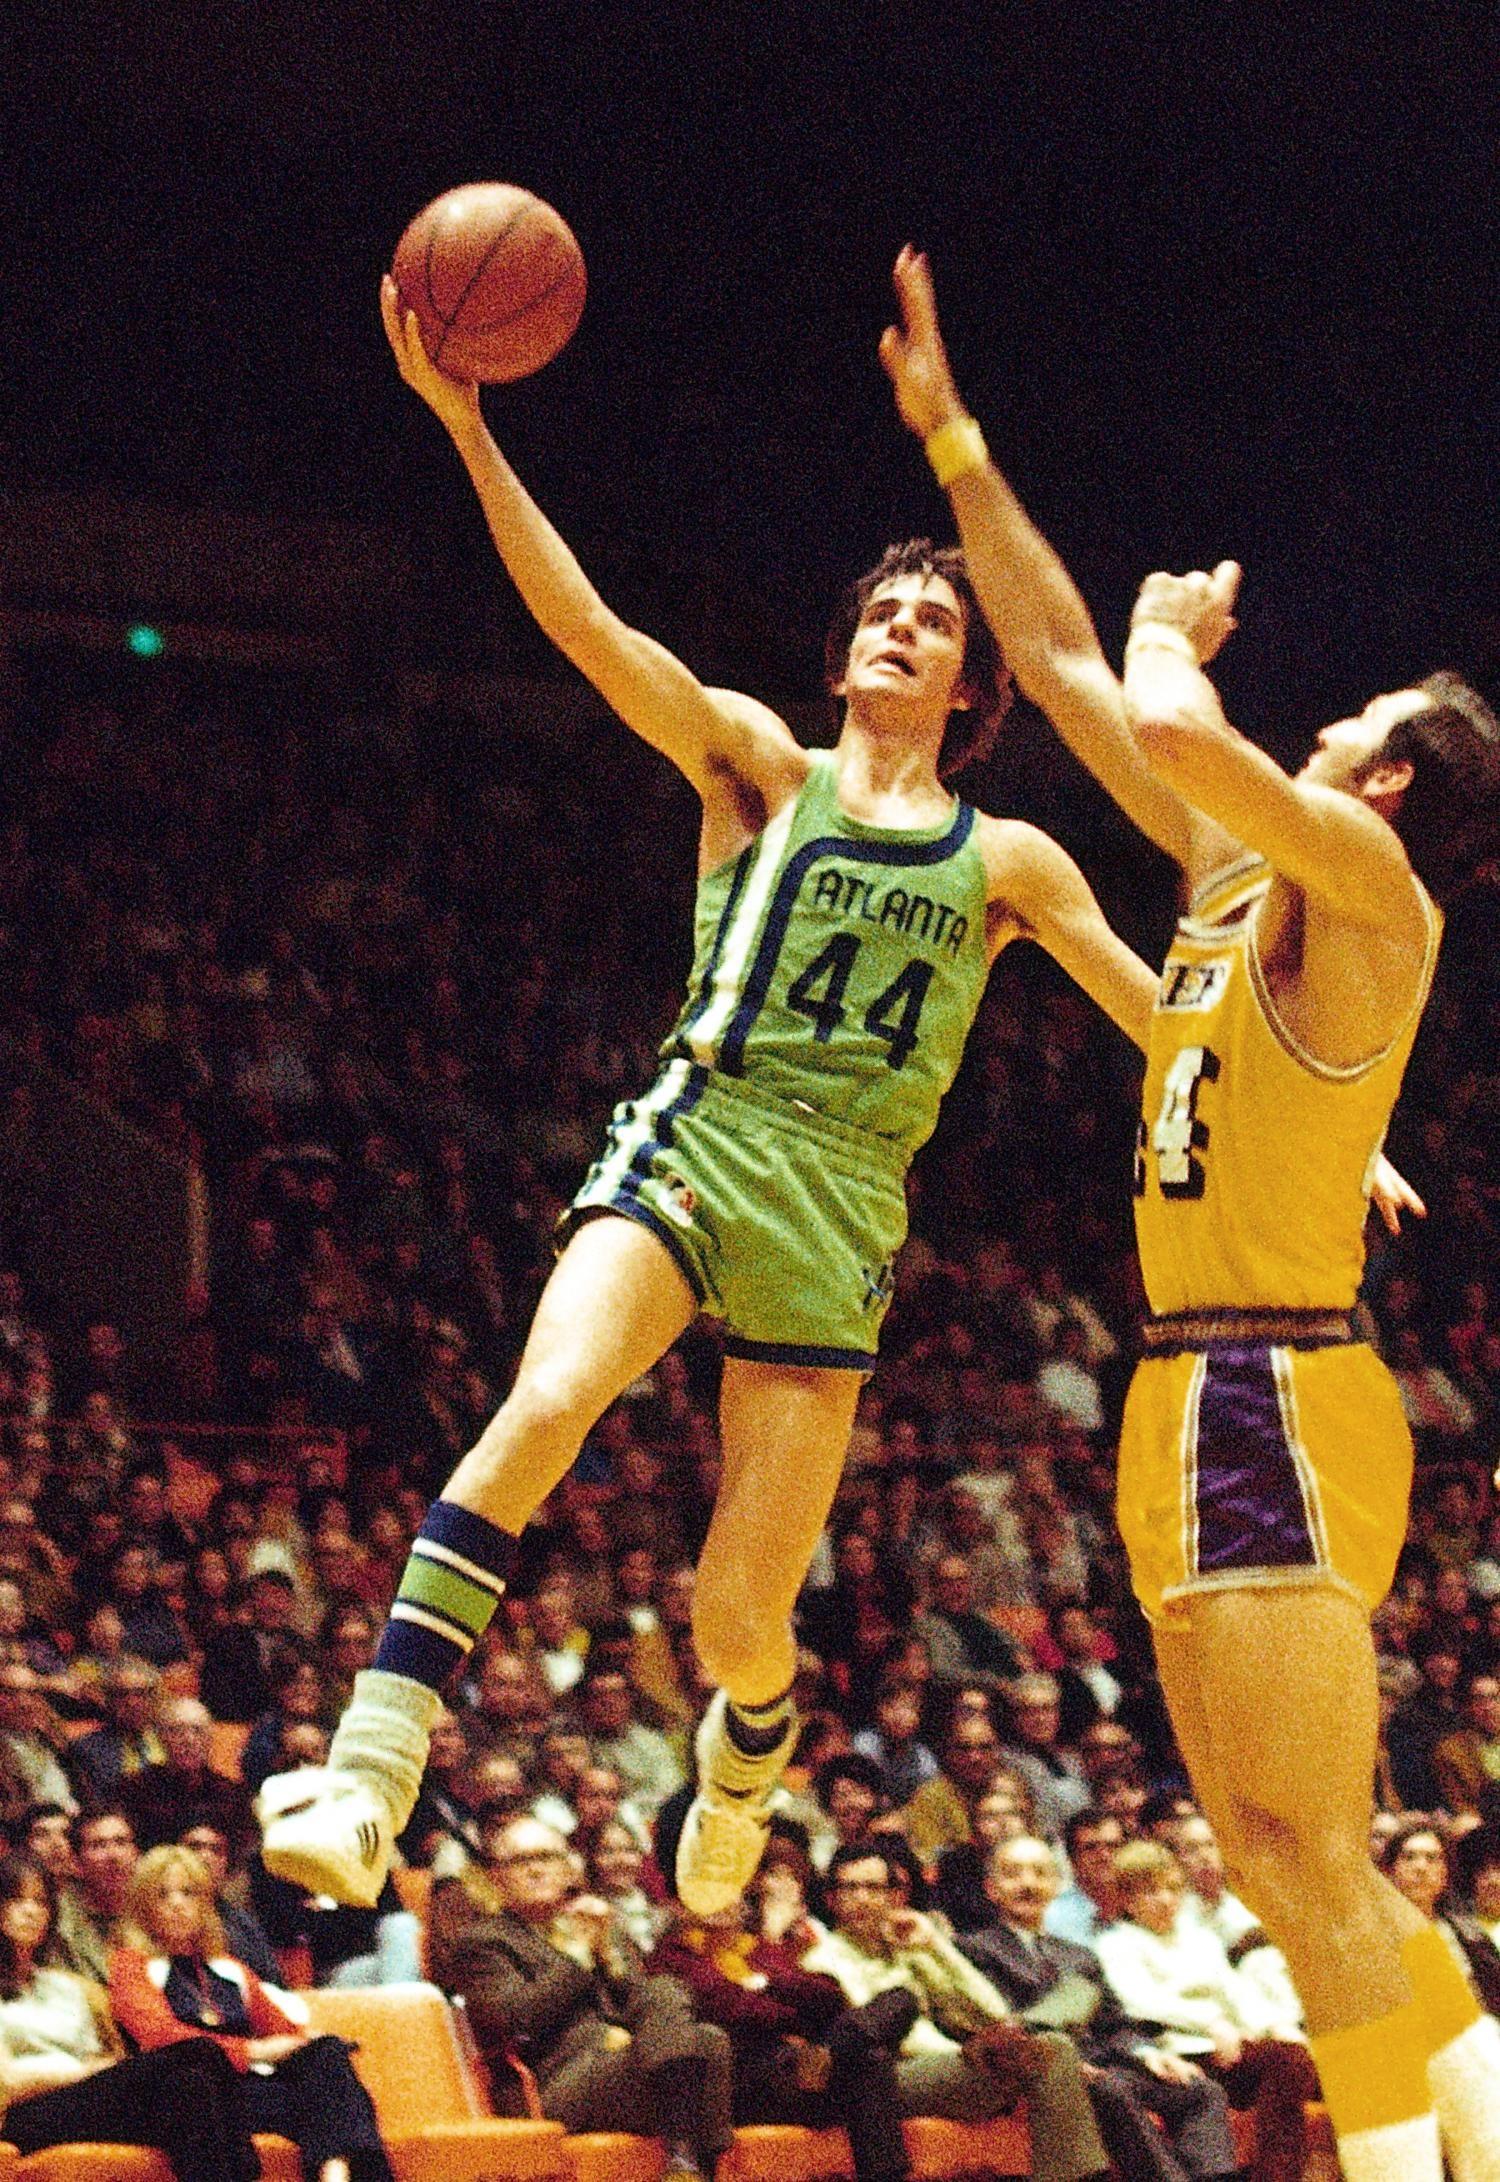 The 25 ugliest jerseys in NBA history sports uniforms